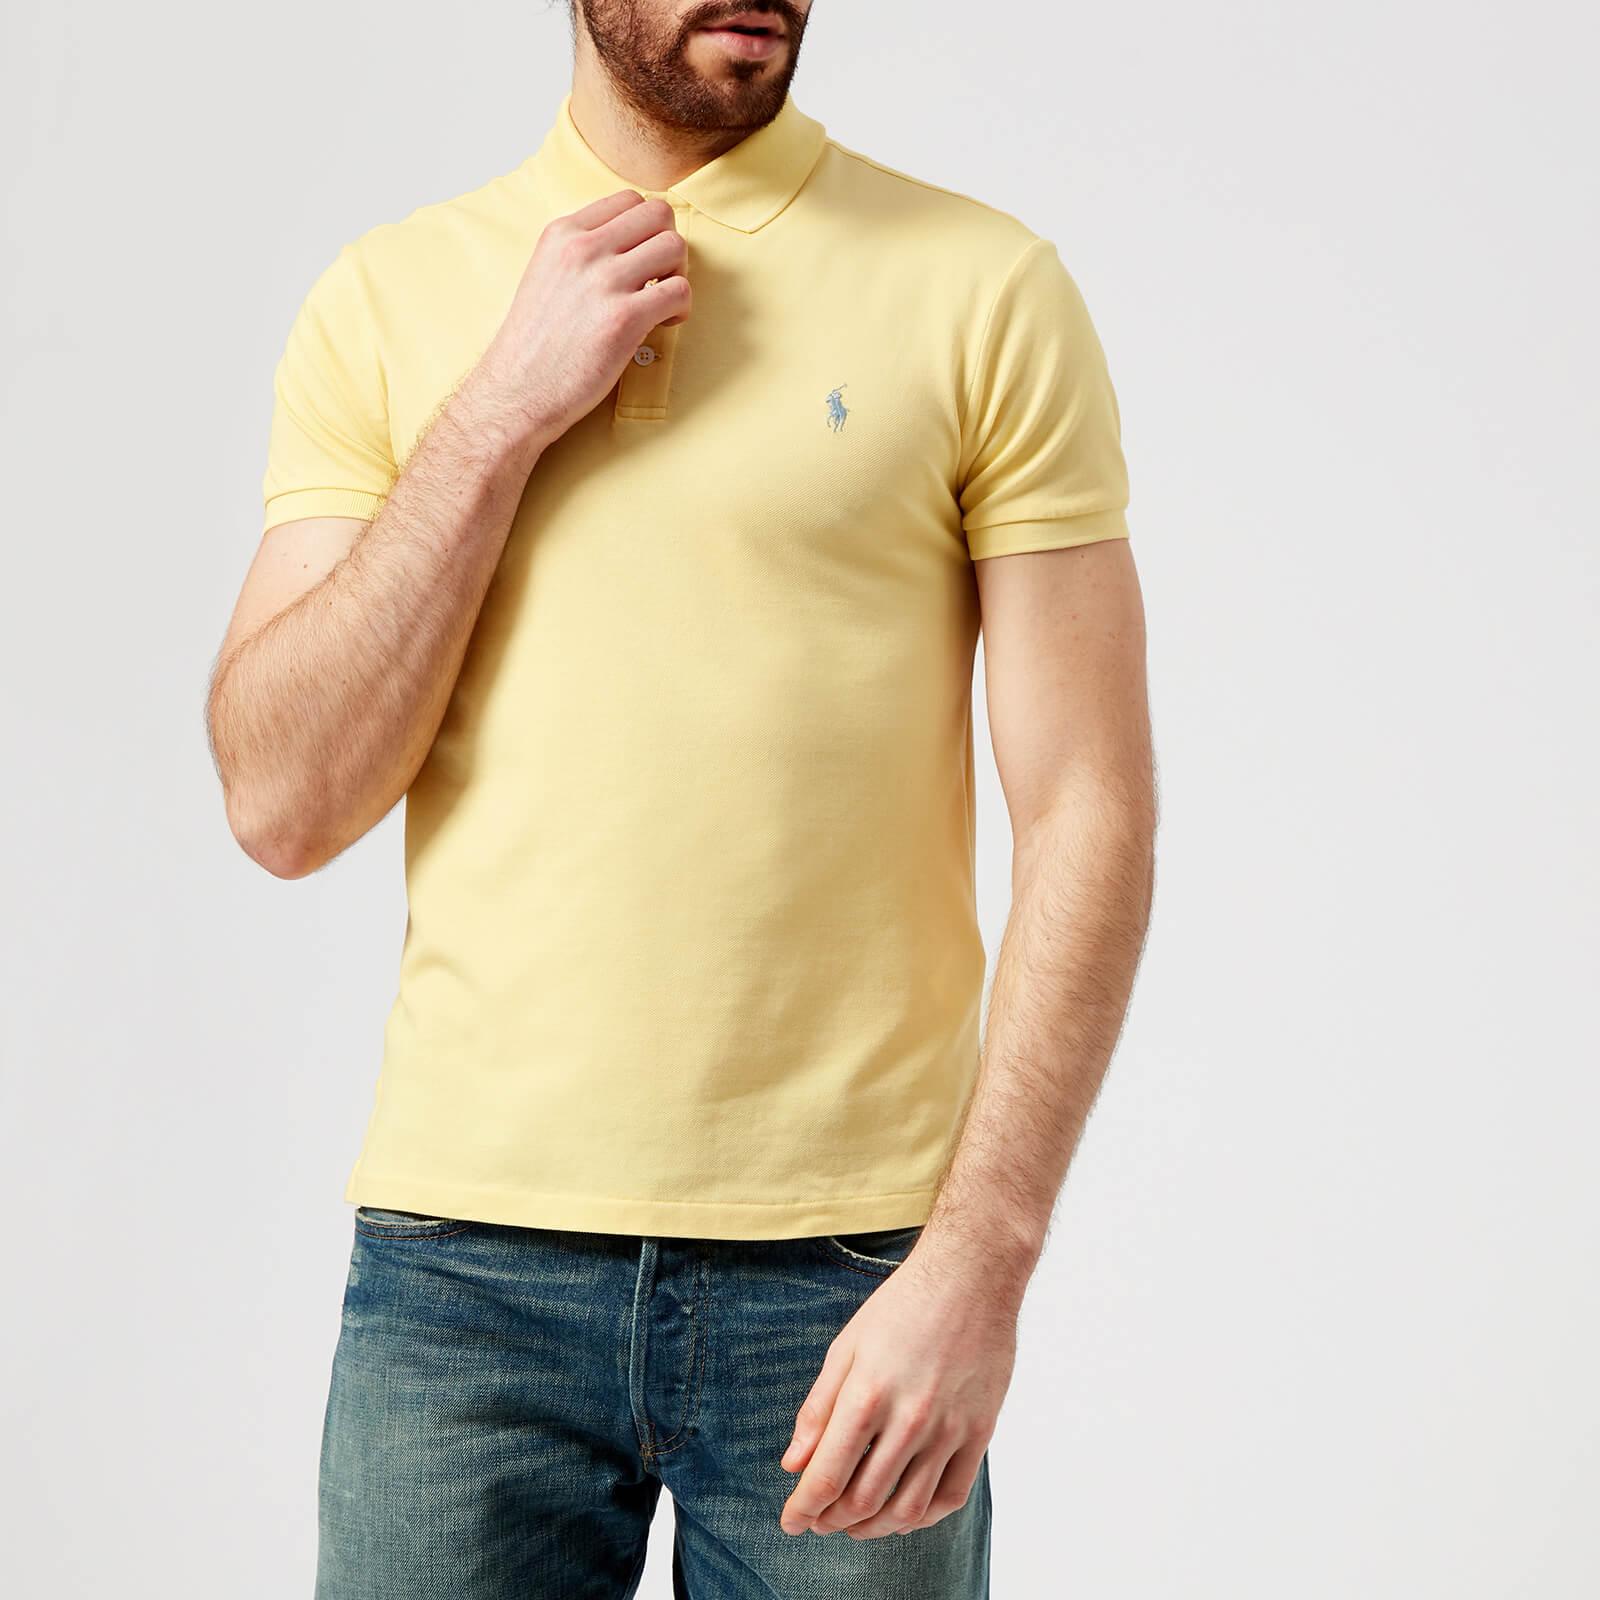 23b7314a Polo Ralph Lauren Men's Stretch Mesh Polo Shirt - Banana Peel